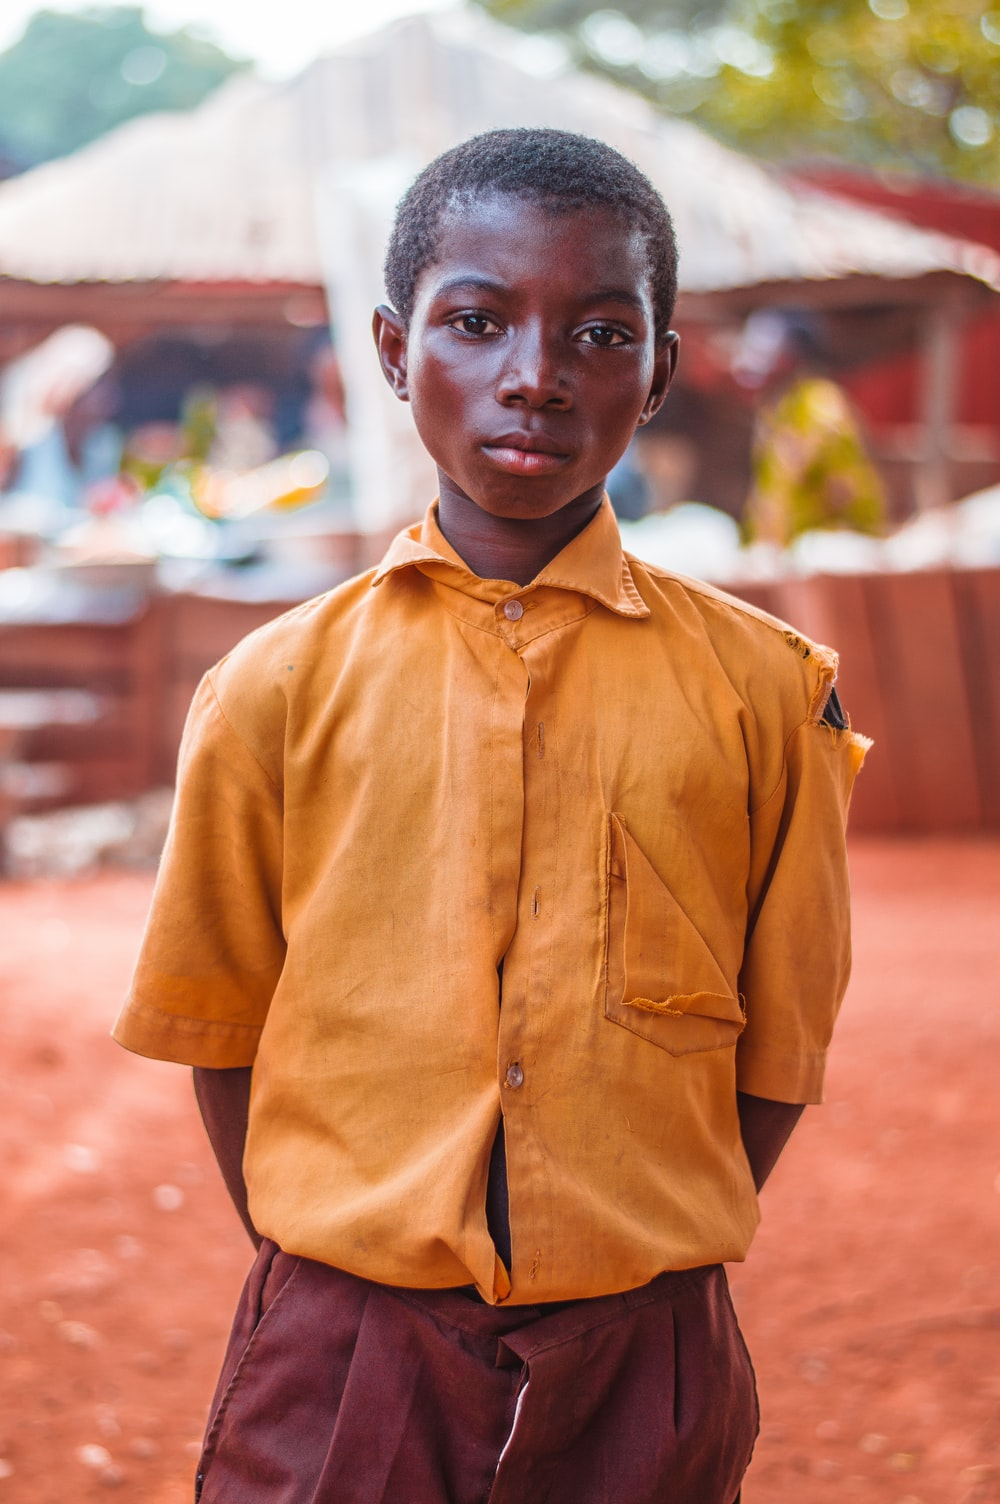 selective focus photo of boy standing